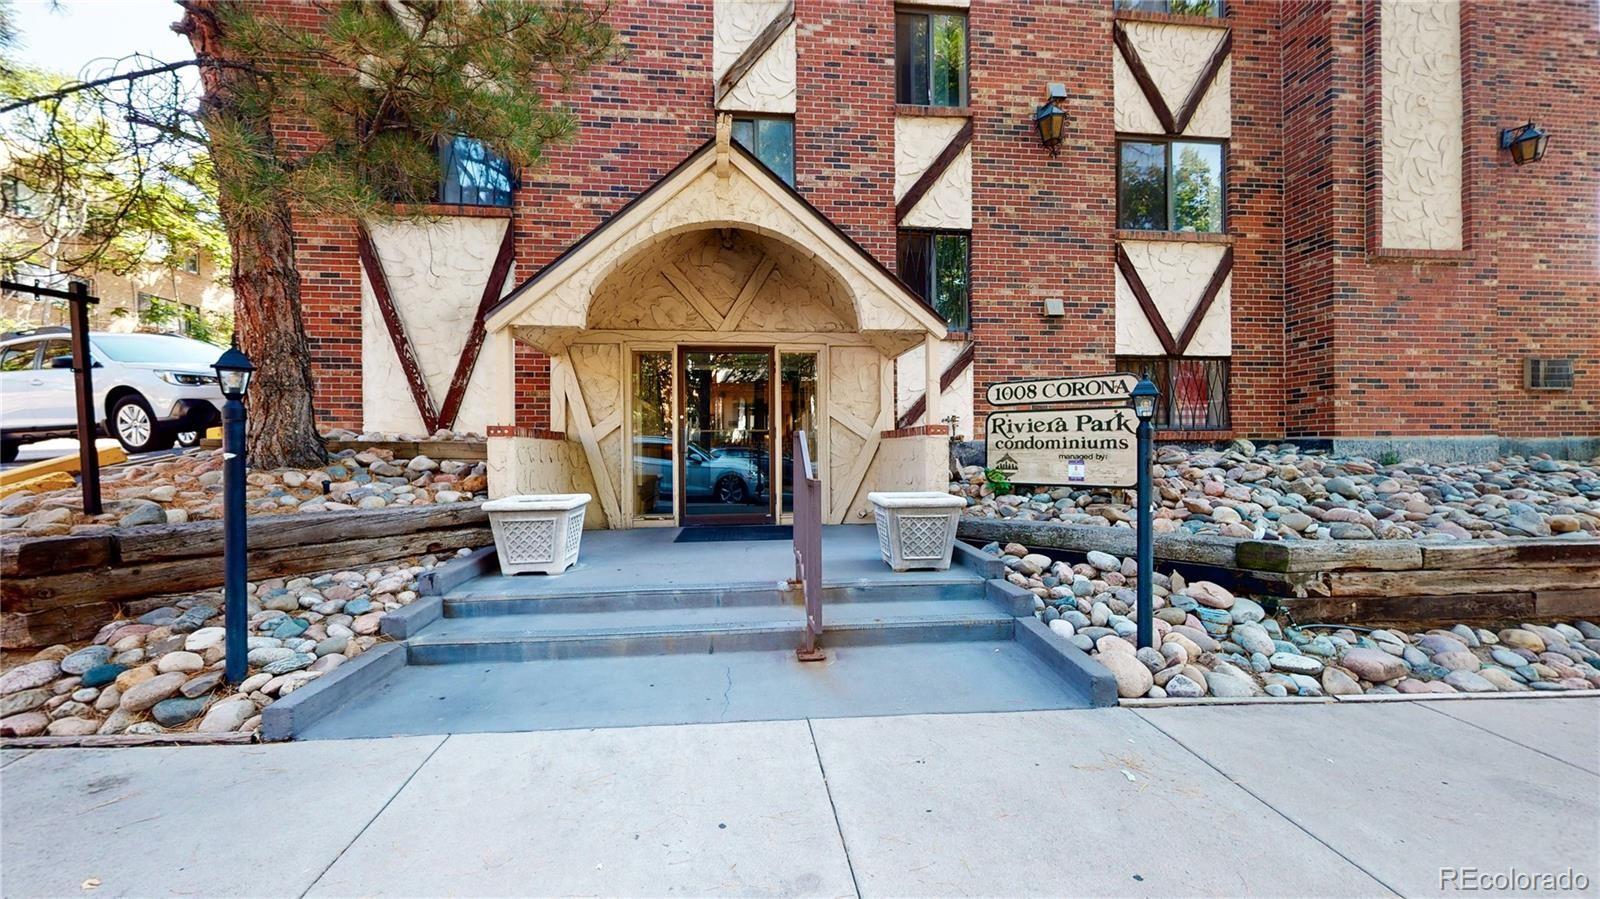 Photo of 1008 N Corona Street #303, Denver, CO 80218 (MLS # 8440232)